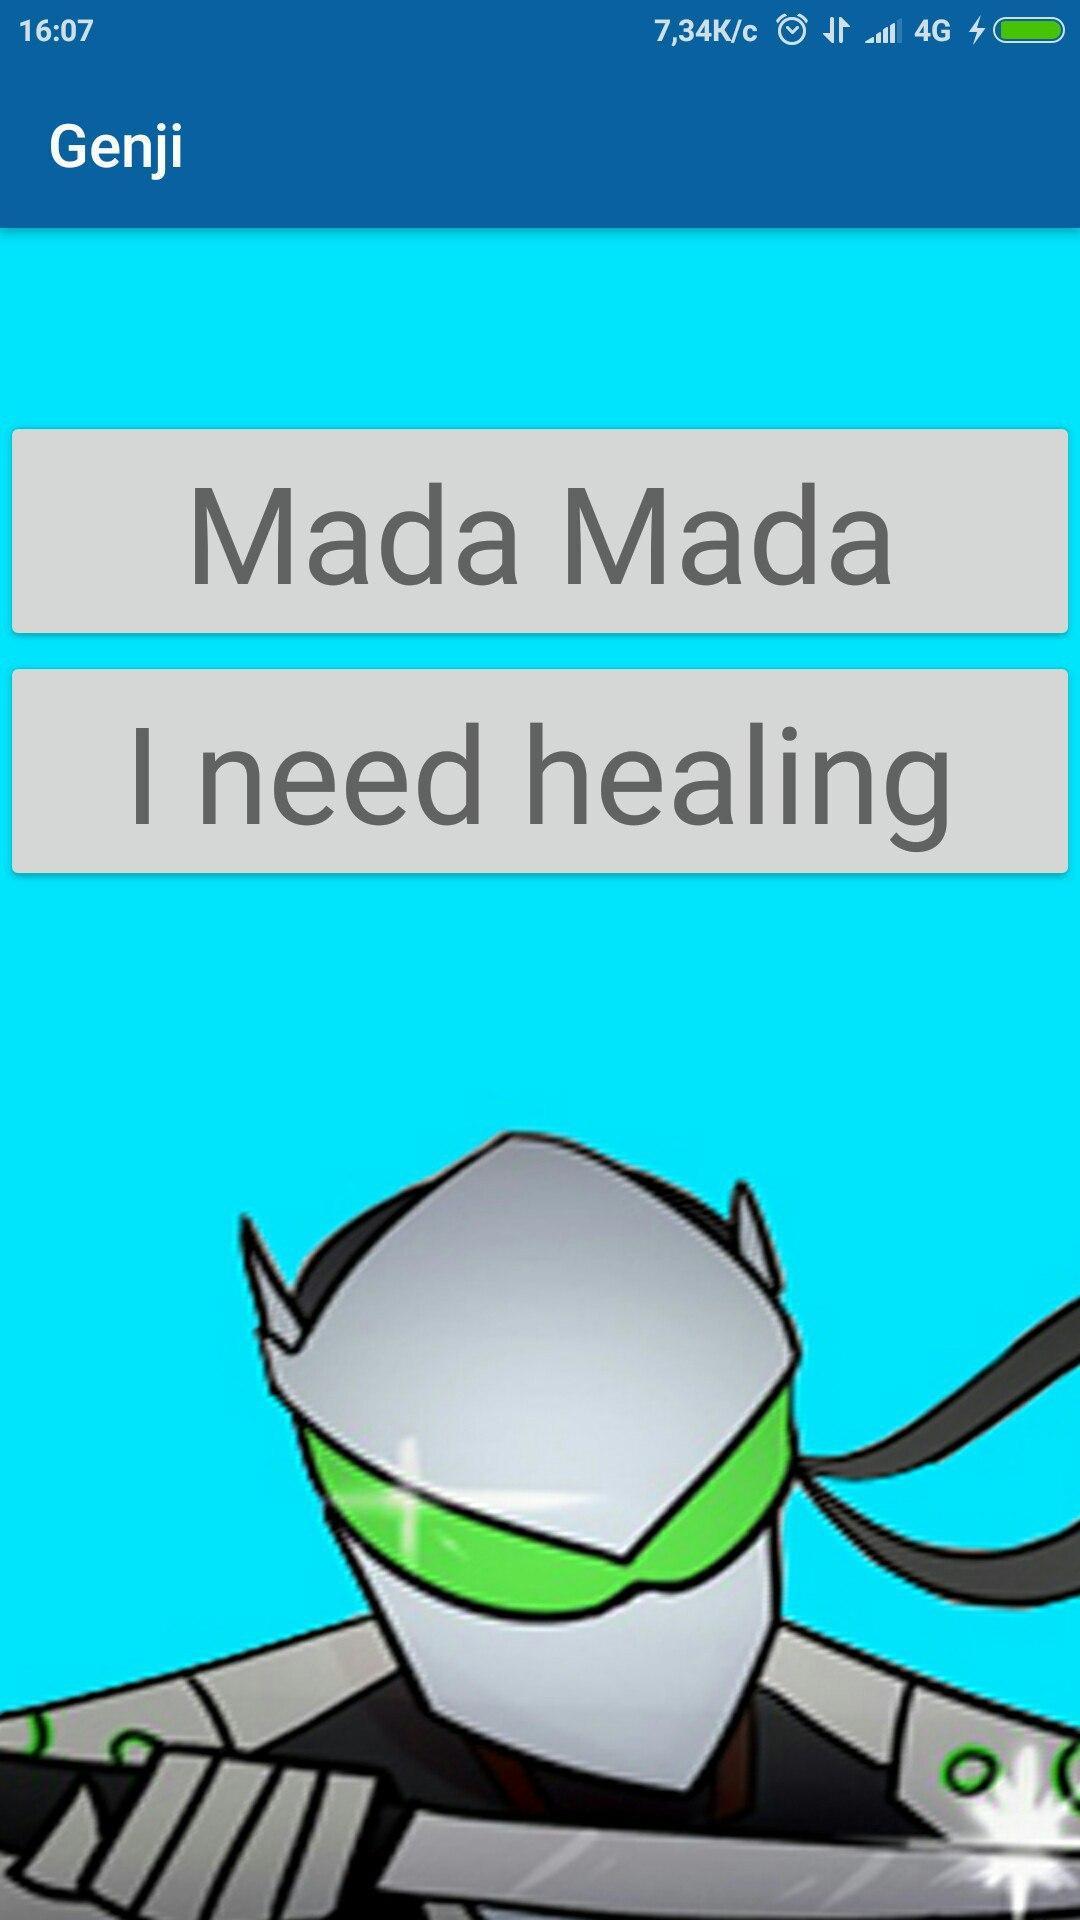 Genji Mada Mada For Android Apk Download Genji are you going to switch. genji mada mada for android apk